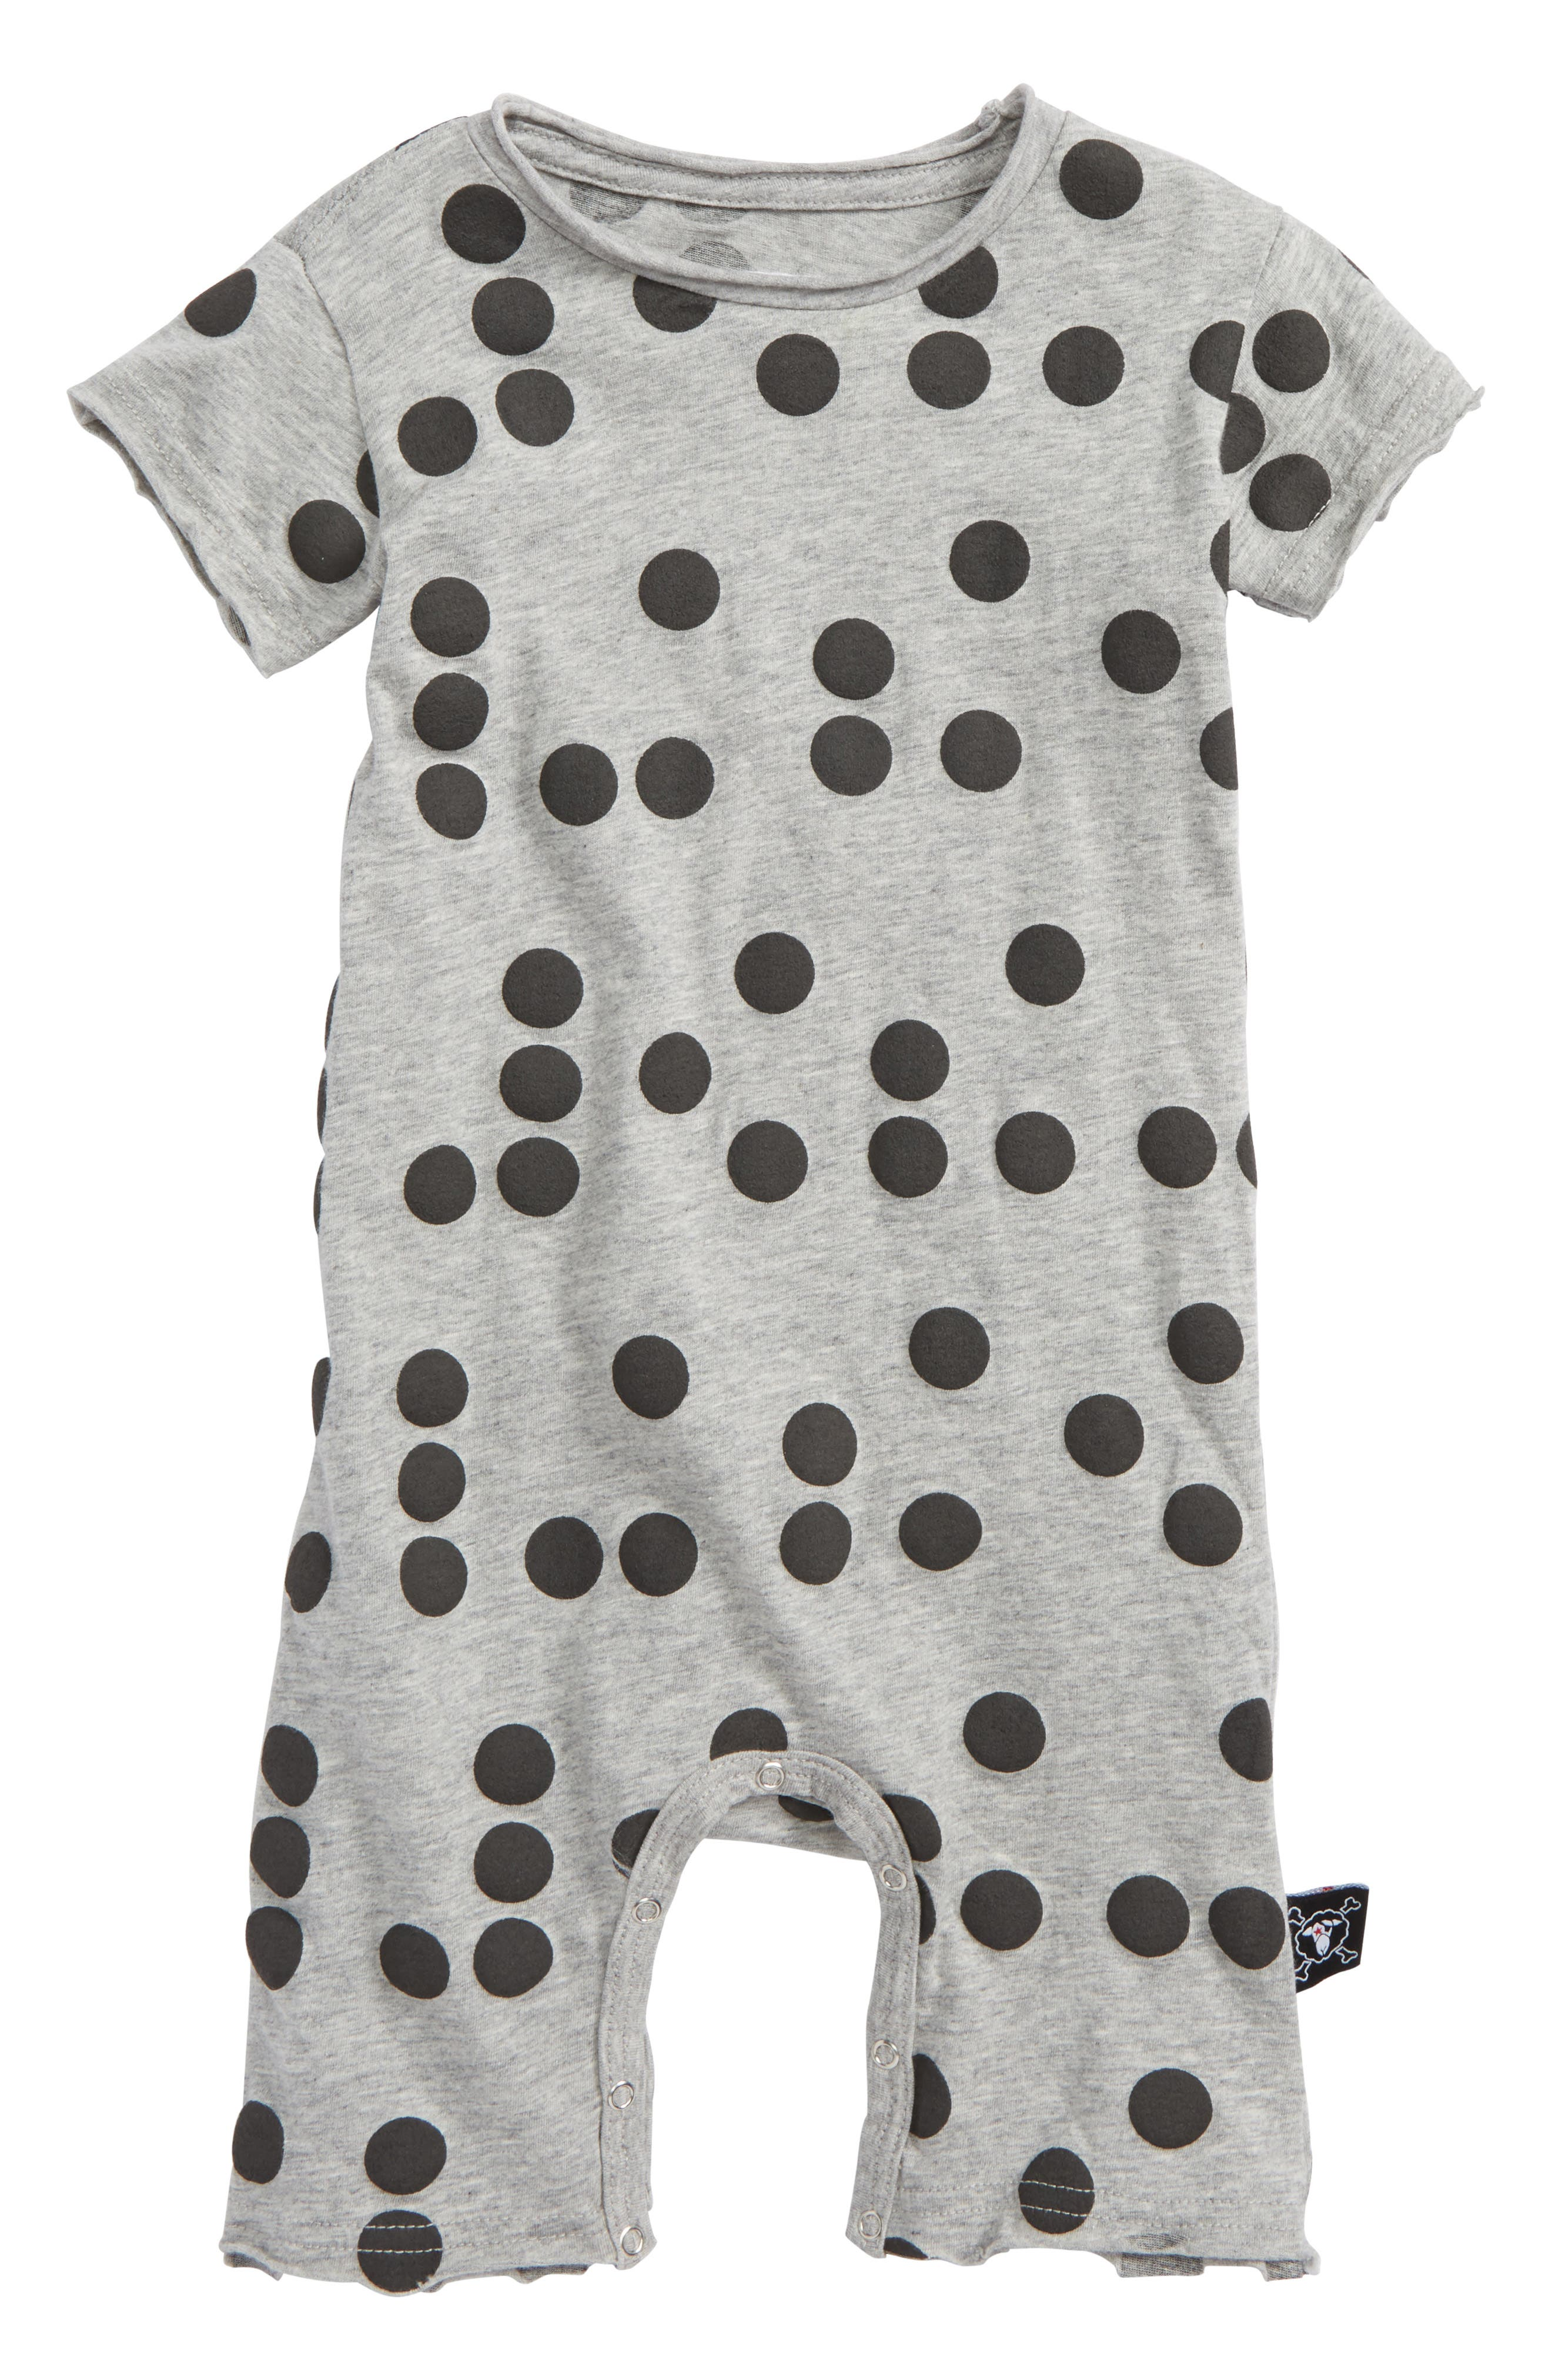 Main Image - Nununu Braille Romper (Baby)